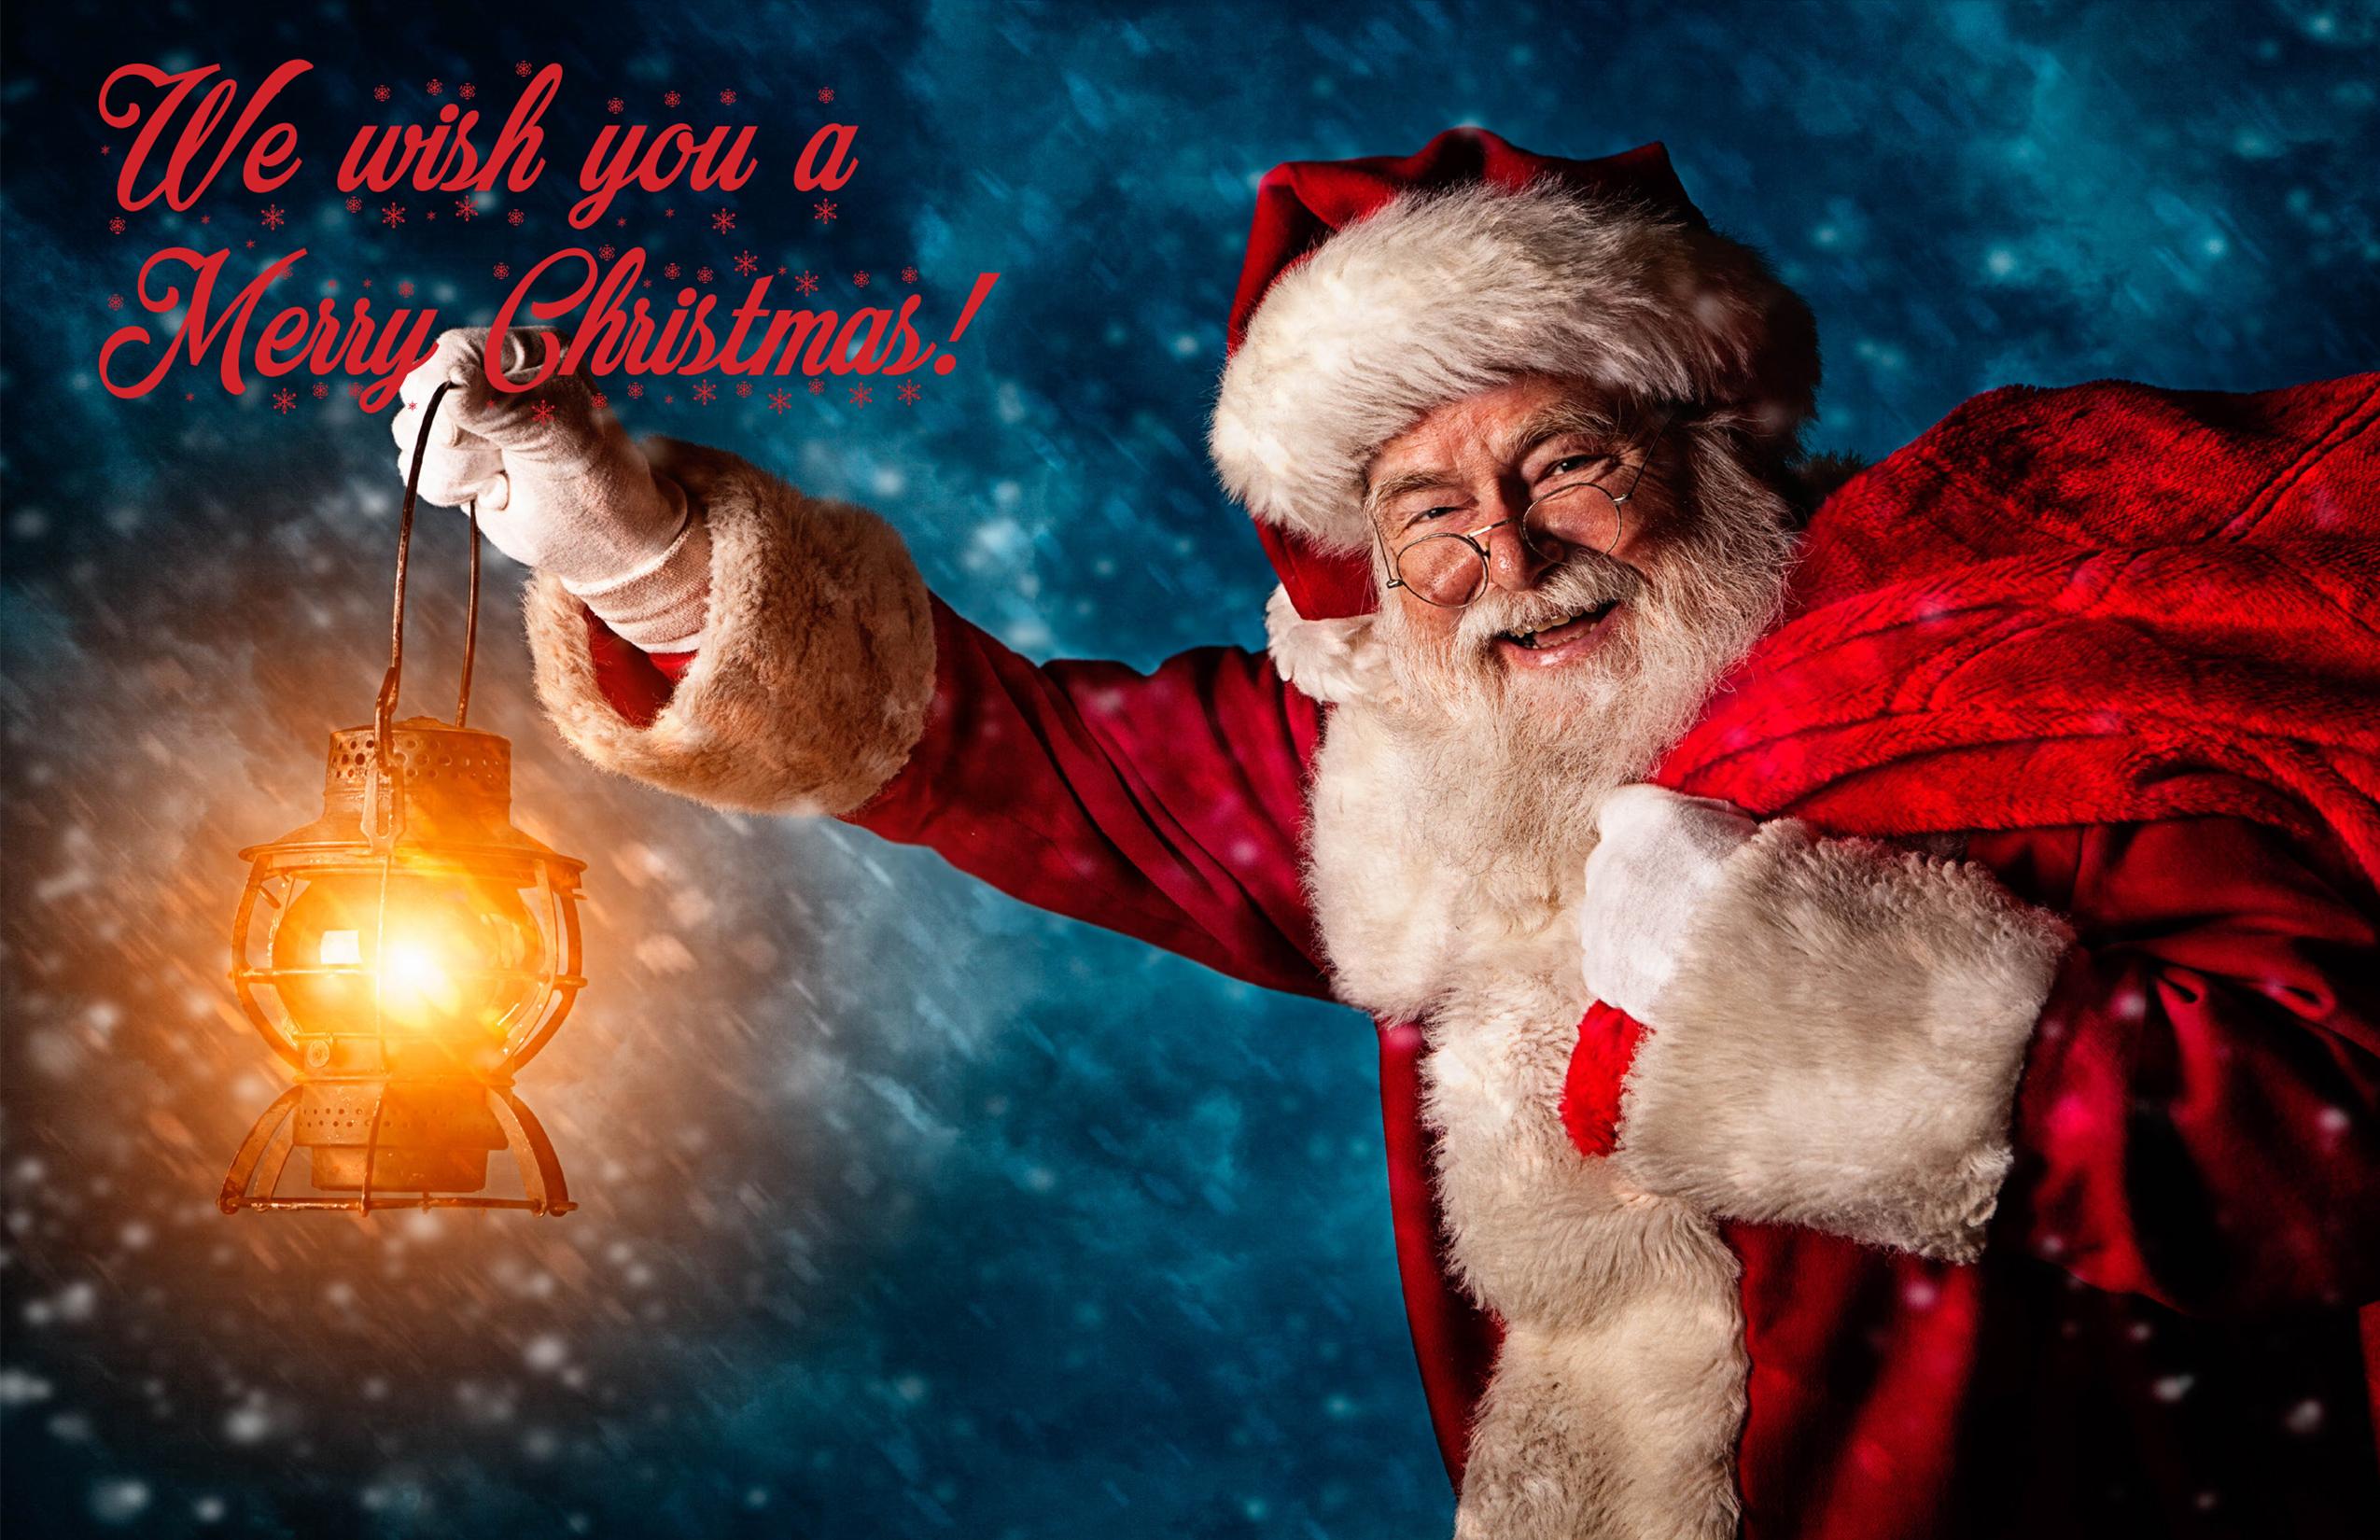 2020 Santa, We Wish You a Merry Christmas Greeting Card